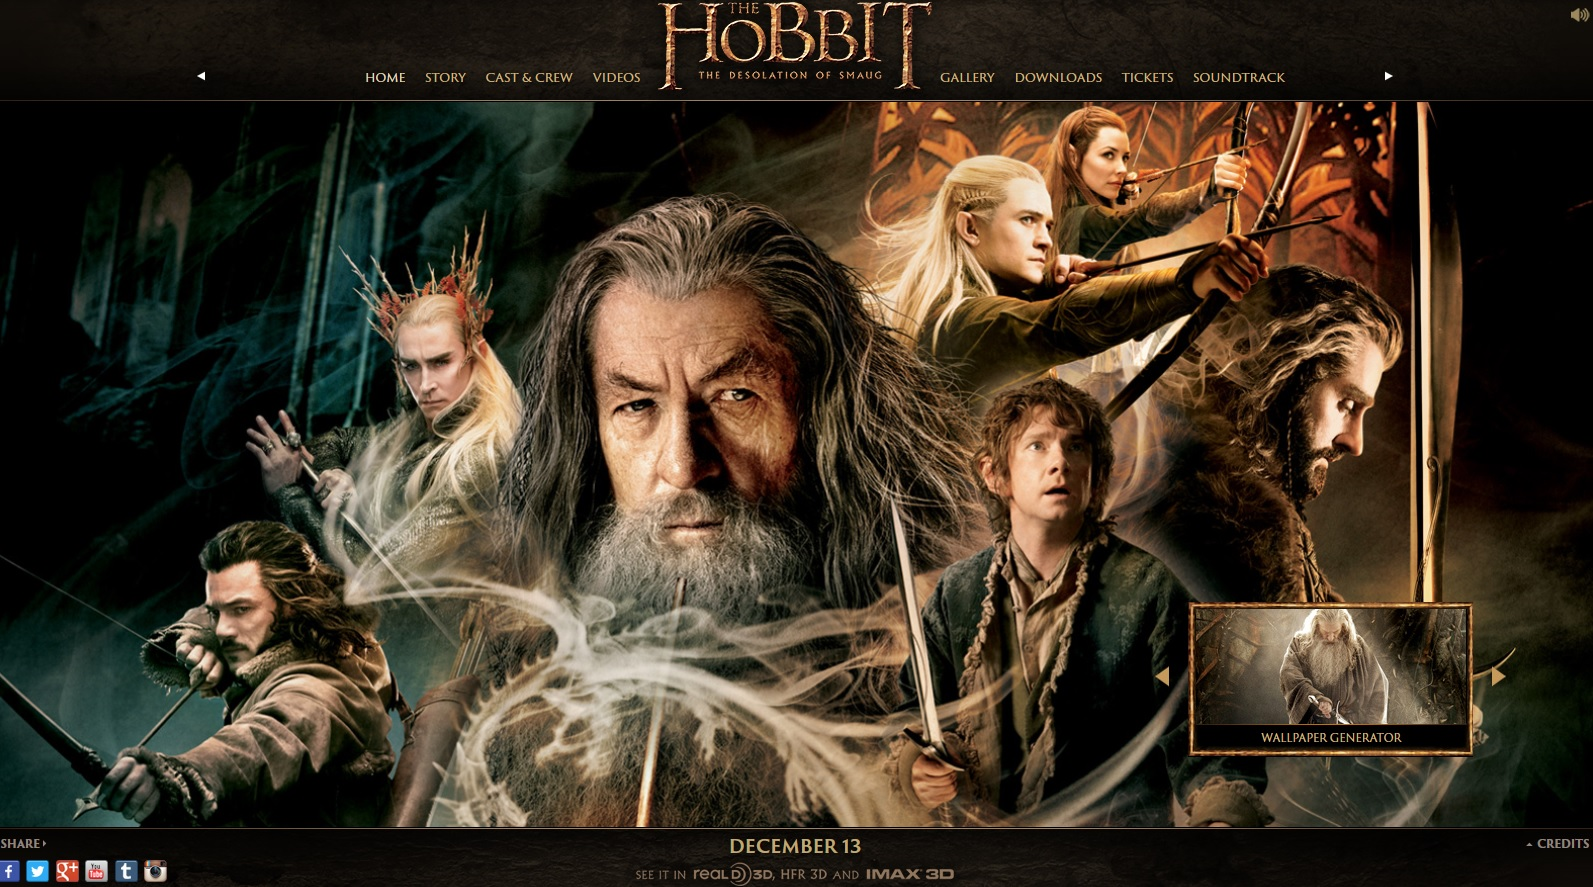 The Hobbit: The Desolation of Smaug (c) Warner Bros. etc.